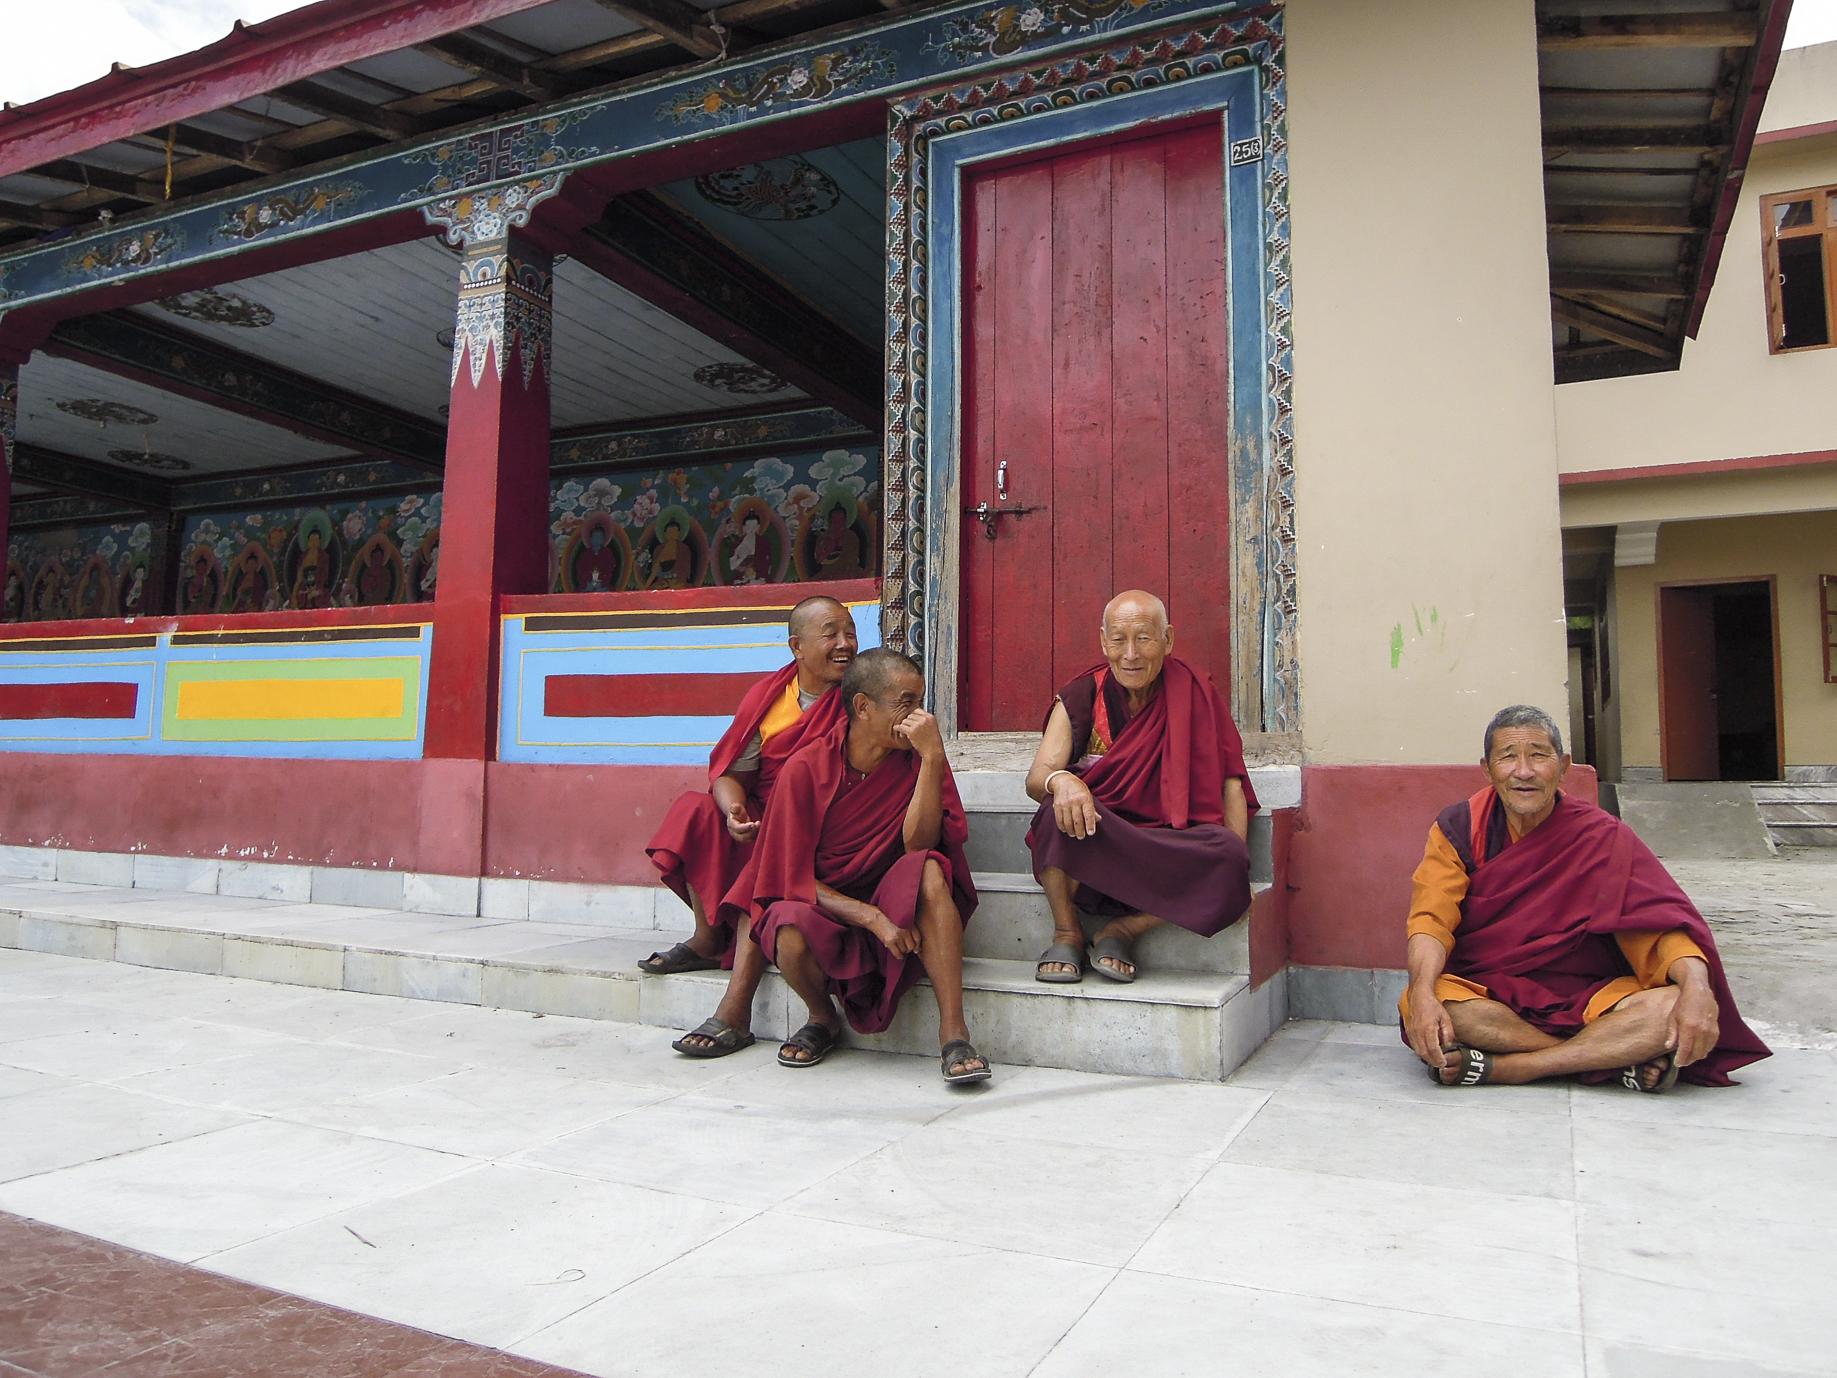 Sikkim, Kloster, Mönche, Sabbatical, organic17